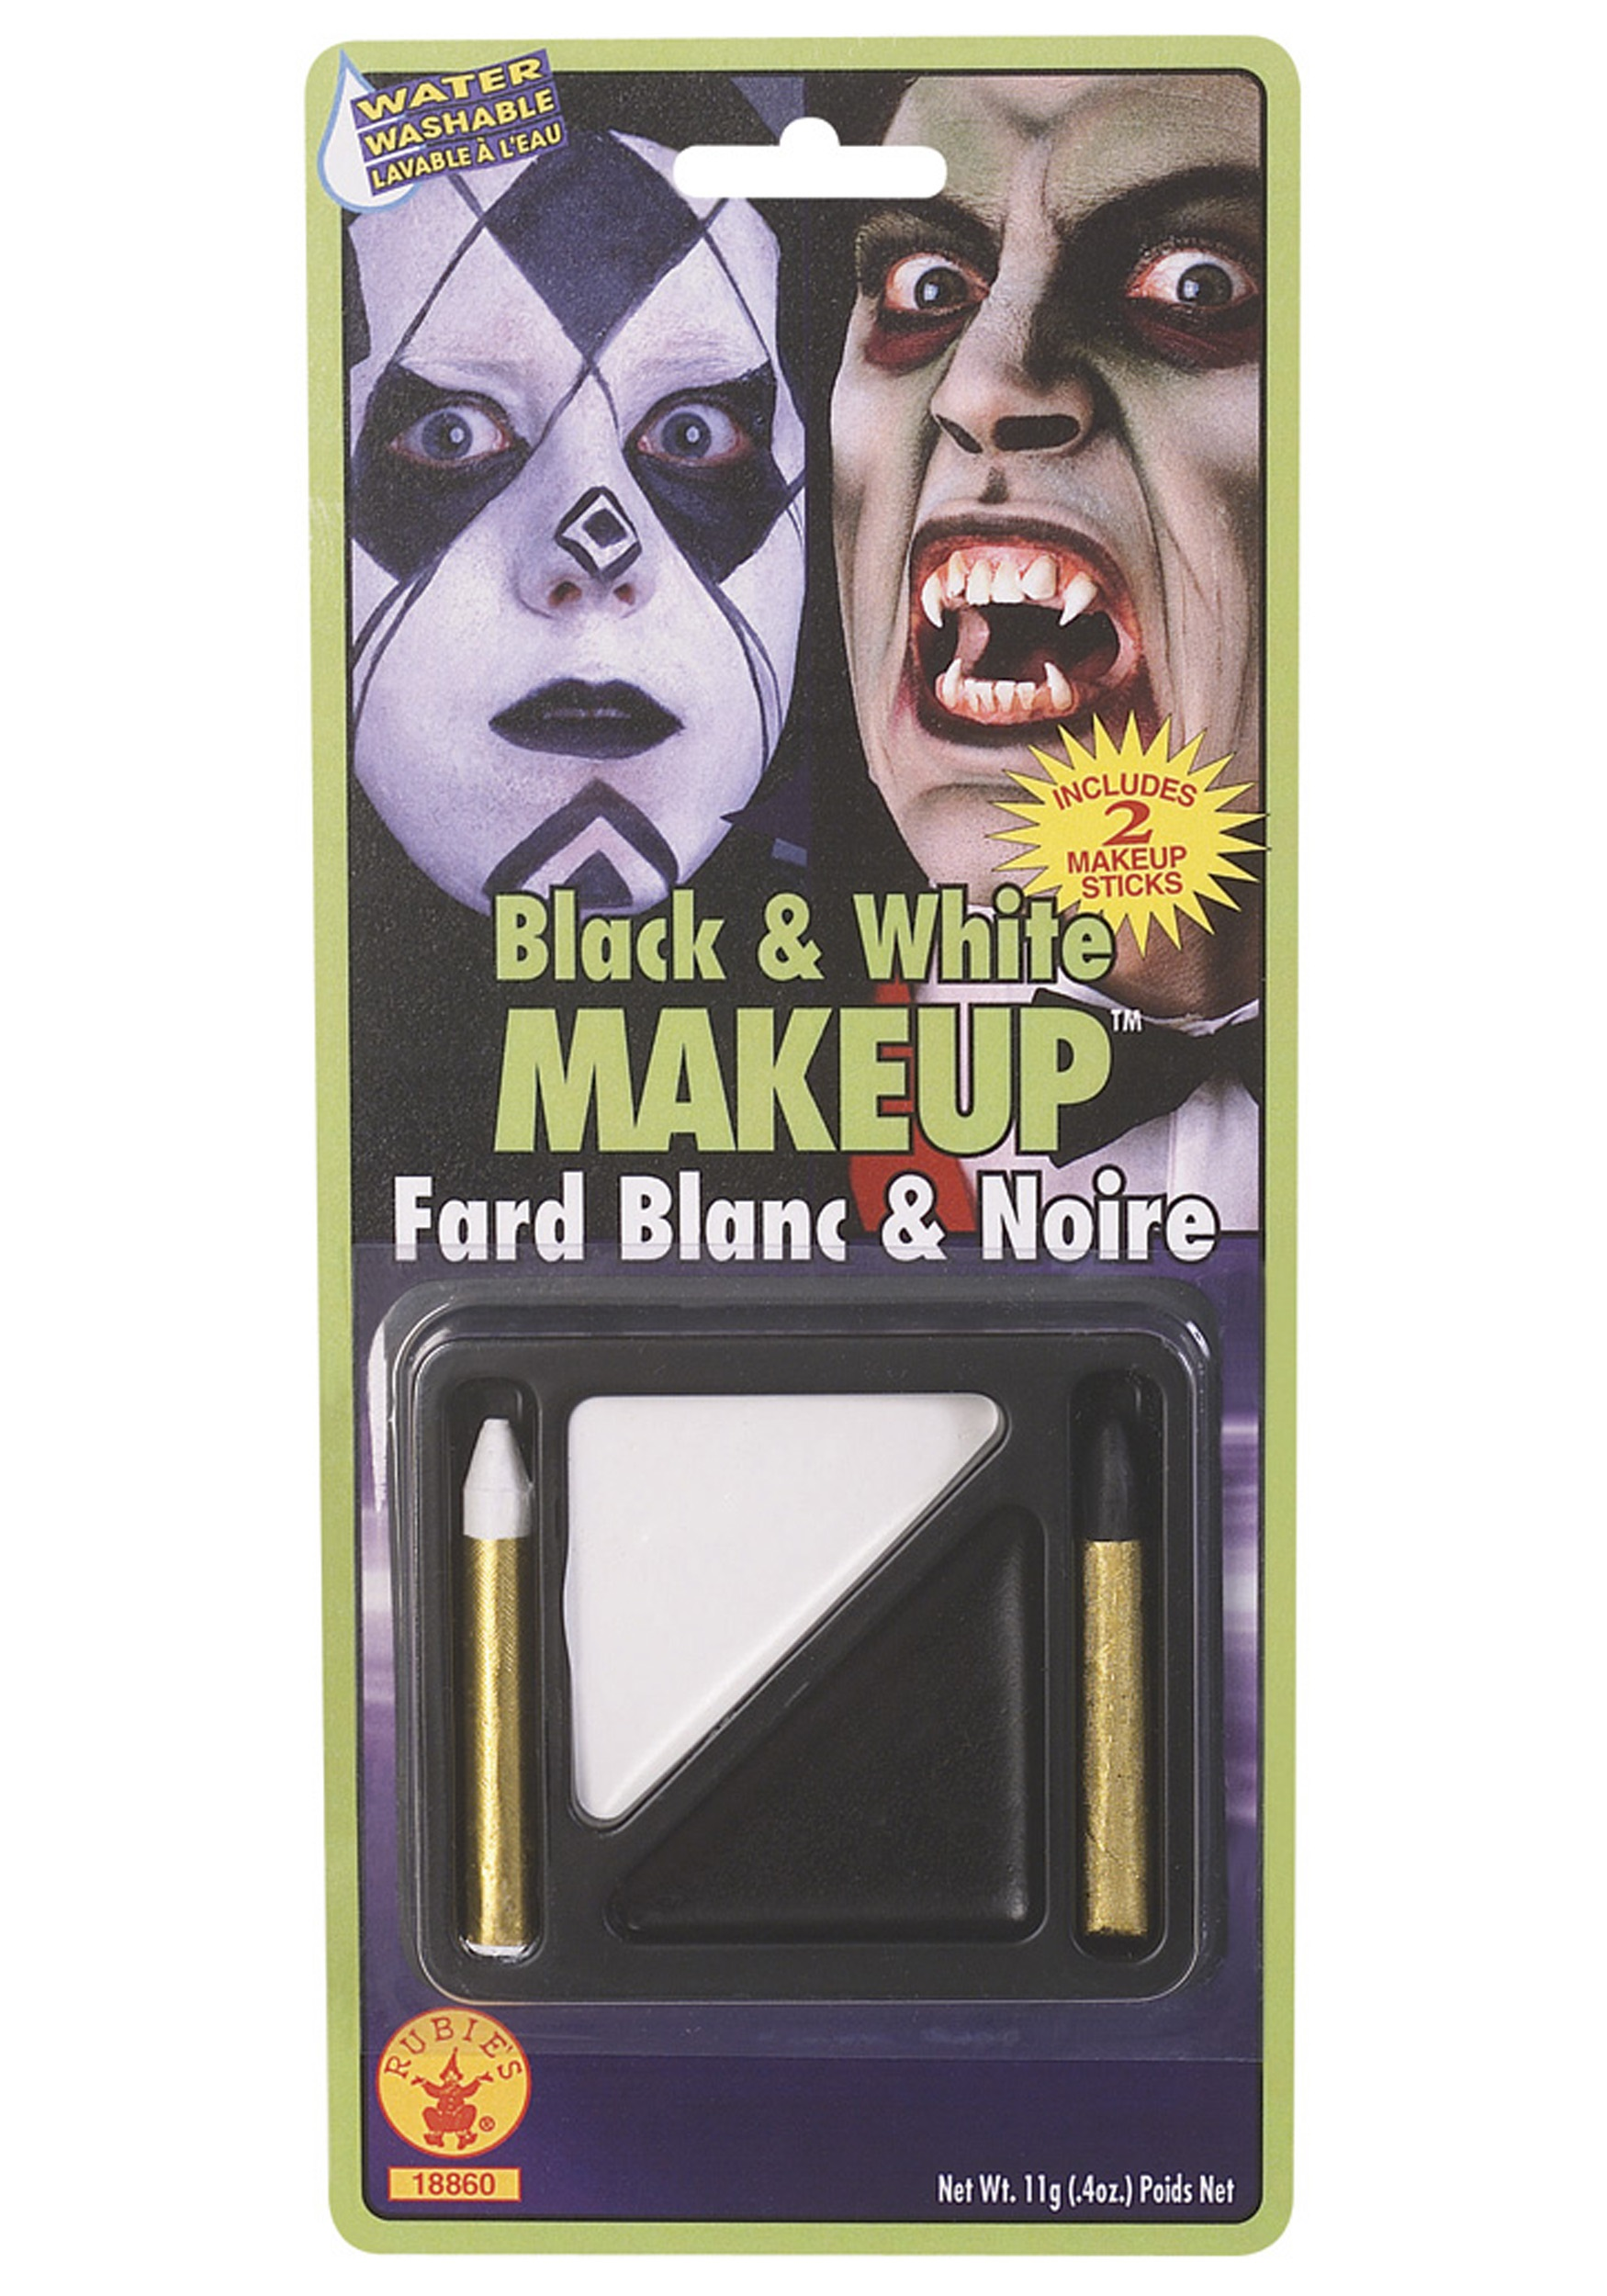 Washable Vampire Makeup